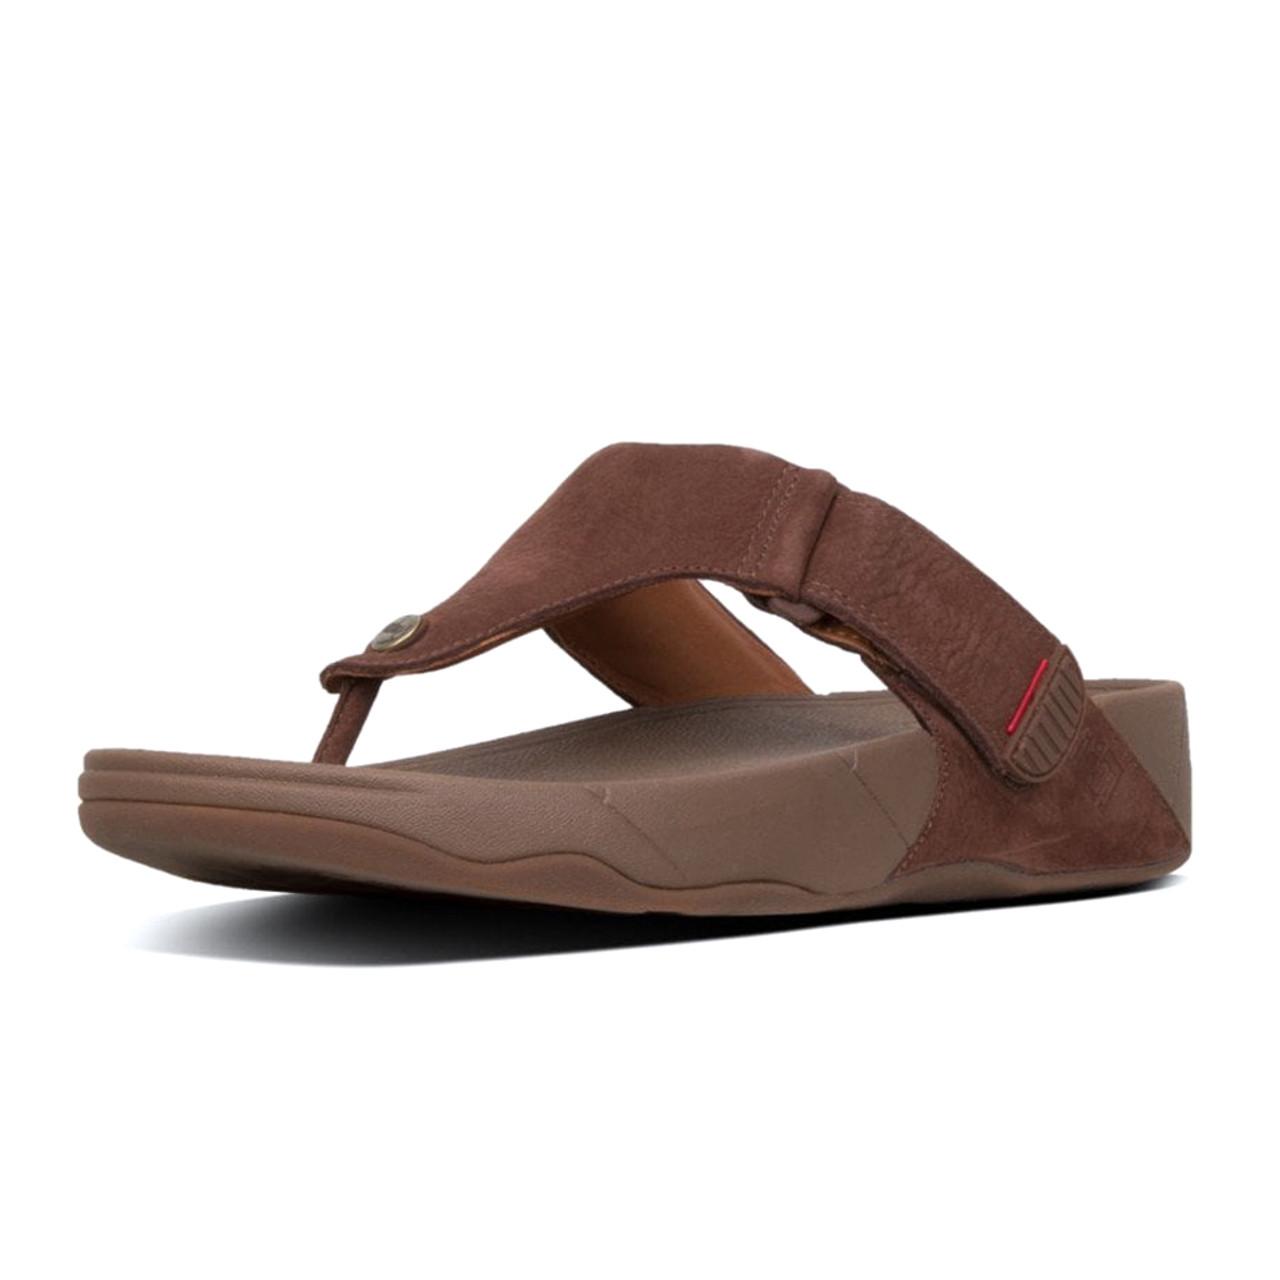 41bdda80a Fitflop Men s Trakk II Nubuck Thong Sandal Chocolate Brown - Shop now    Shoolu.com